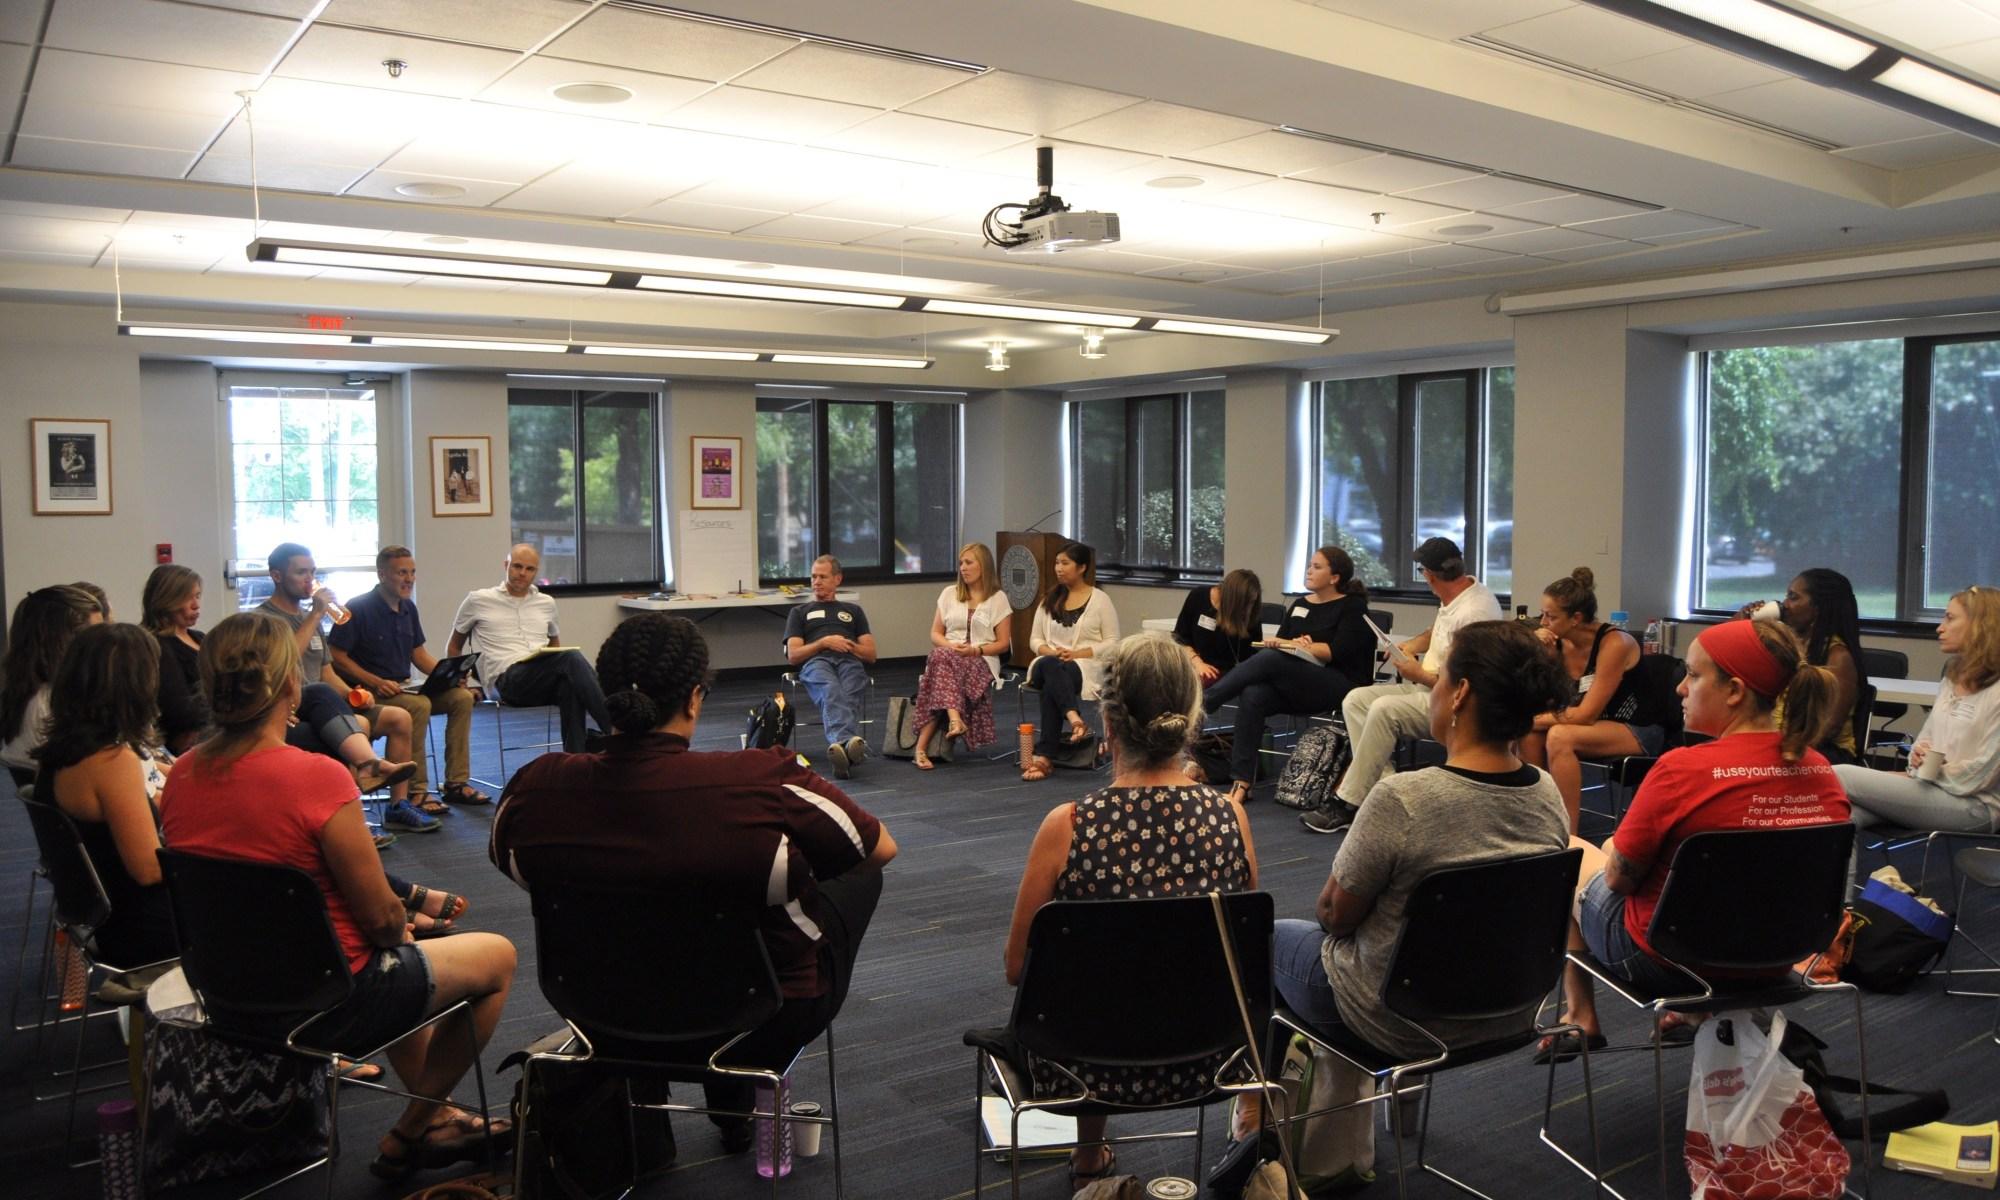 Teachers sitting in circle